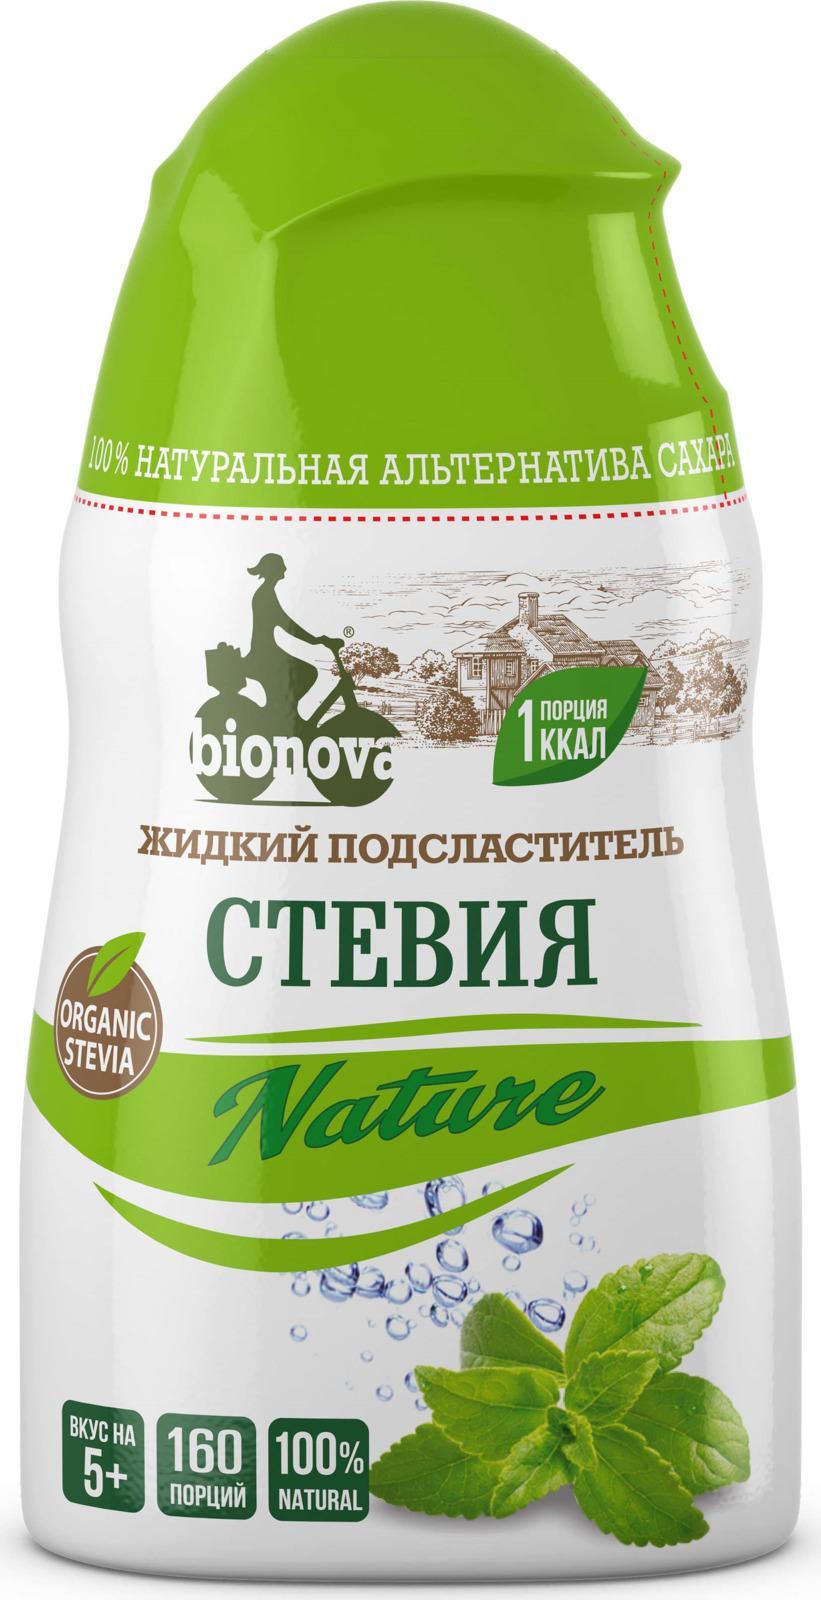 Сахарозаменитель Bionova Стевия жидкий, 80 г bio tradition стевия натуральный заменитель сахара 30 г